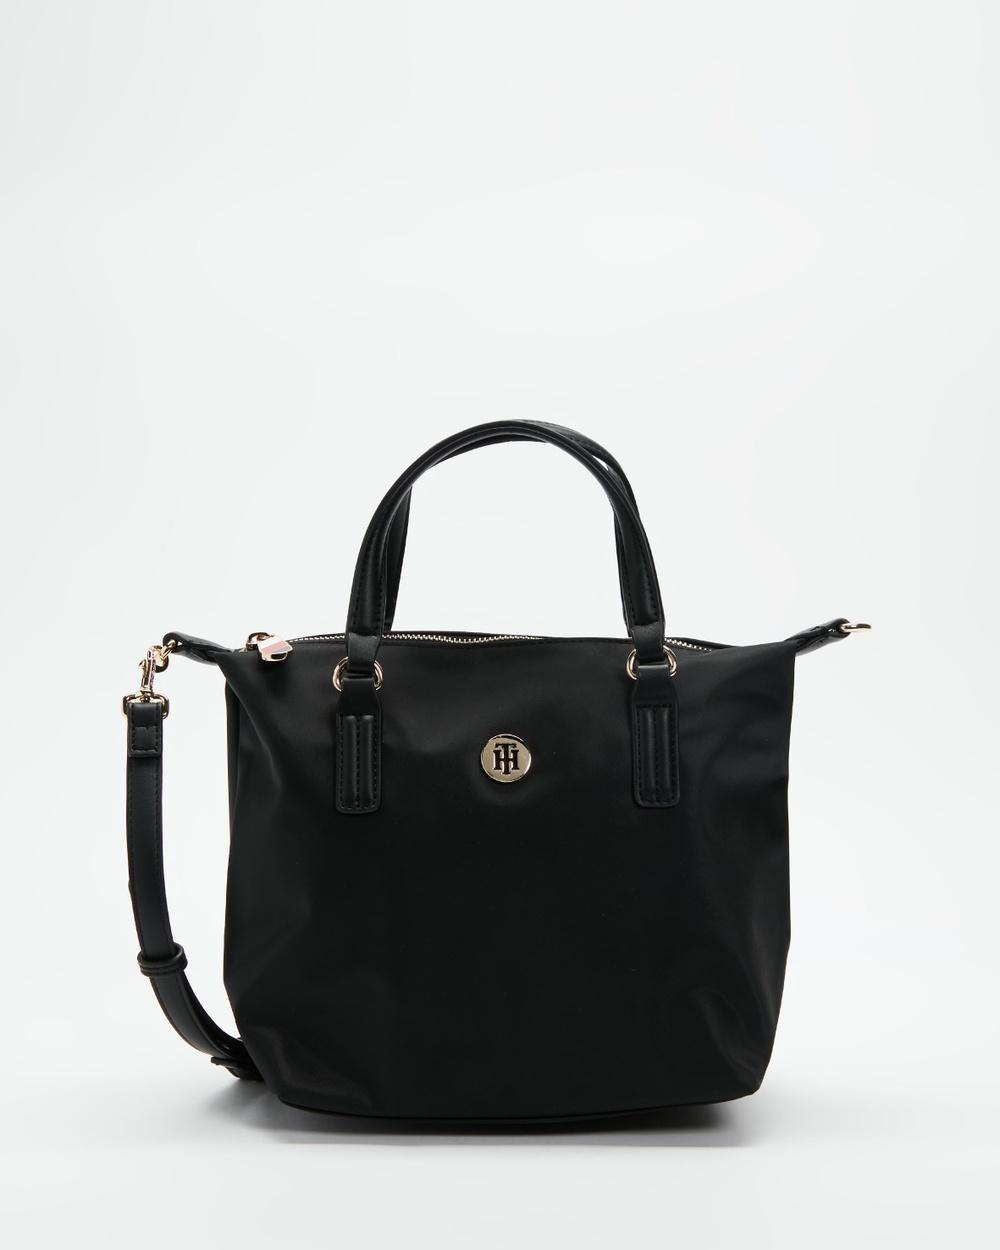 Tommy Hilfiger Poppy Small Tote Bag Handbags Black